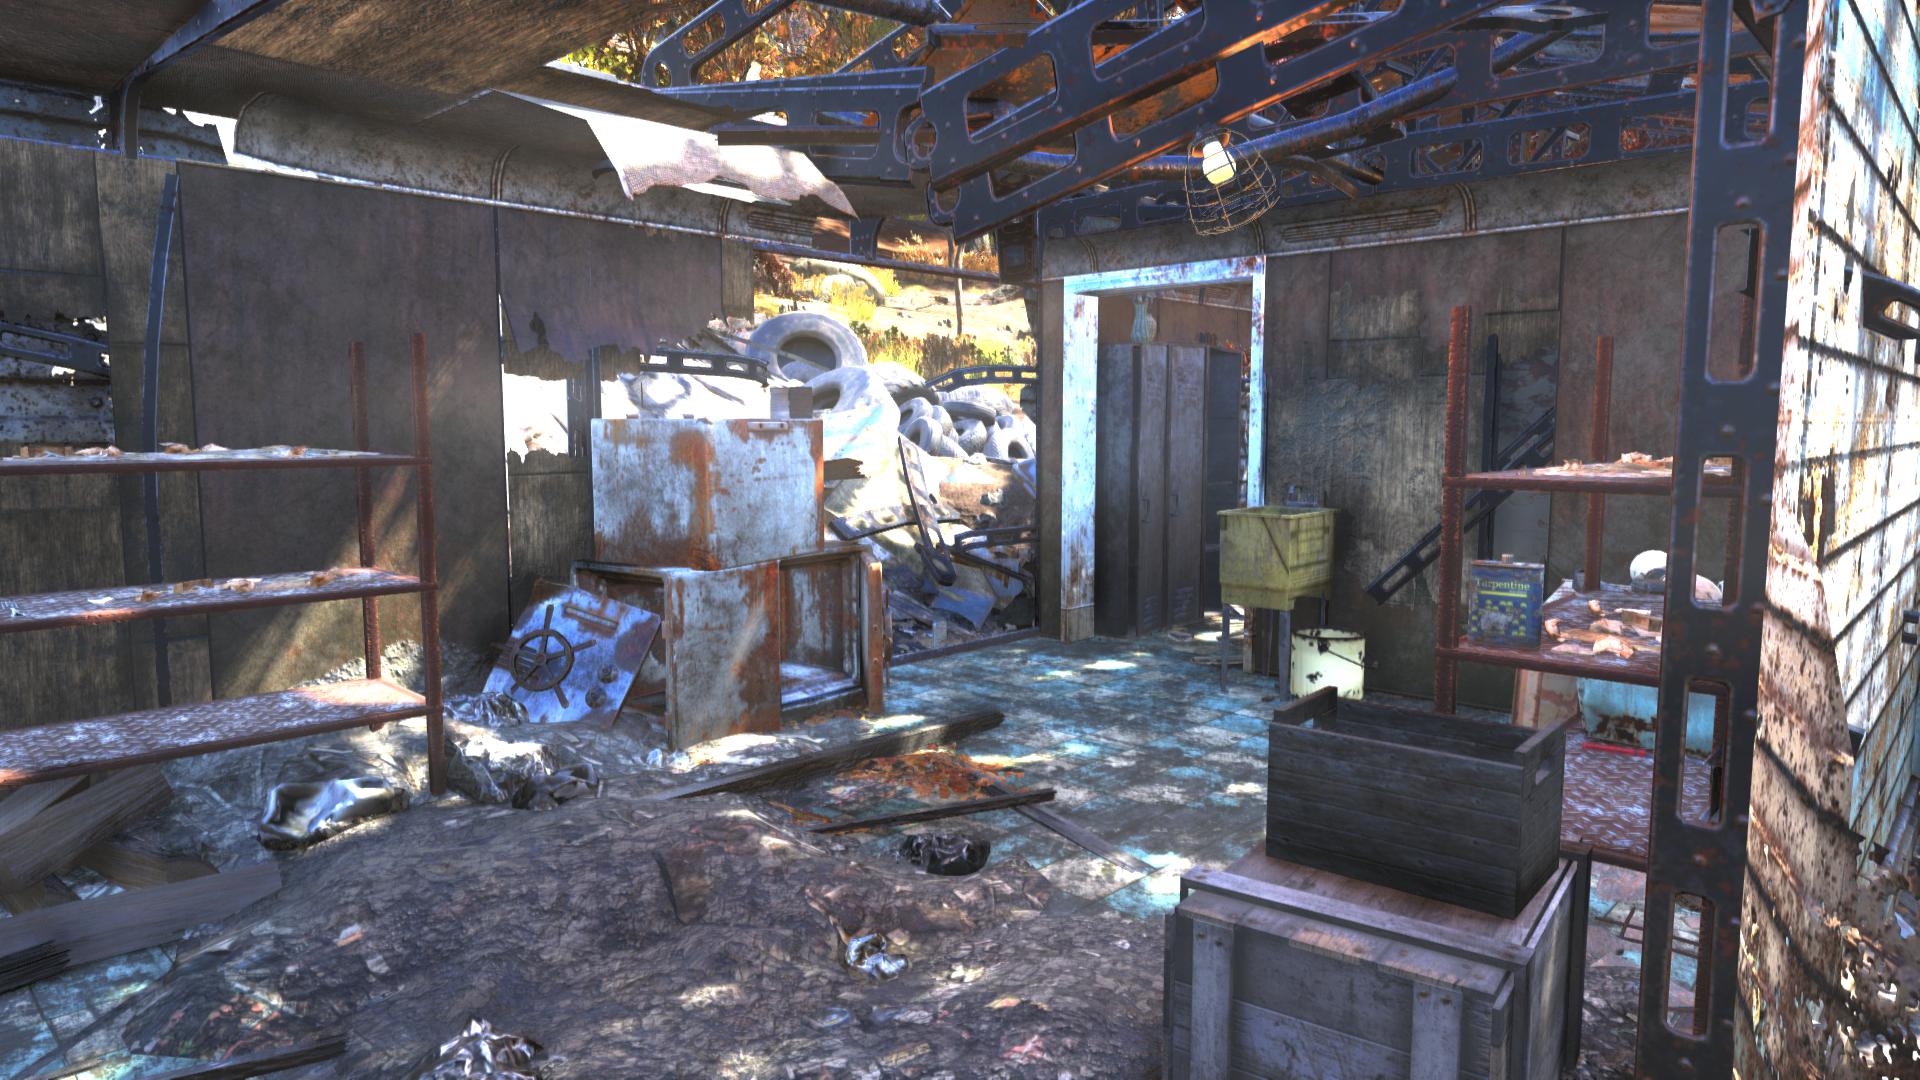 FO76 safecracker's shack interior